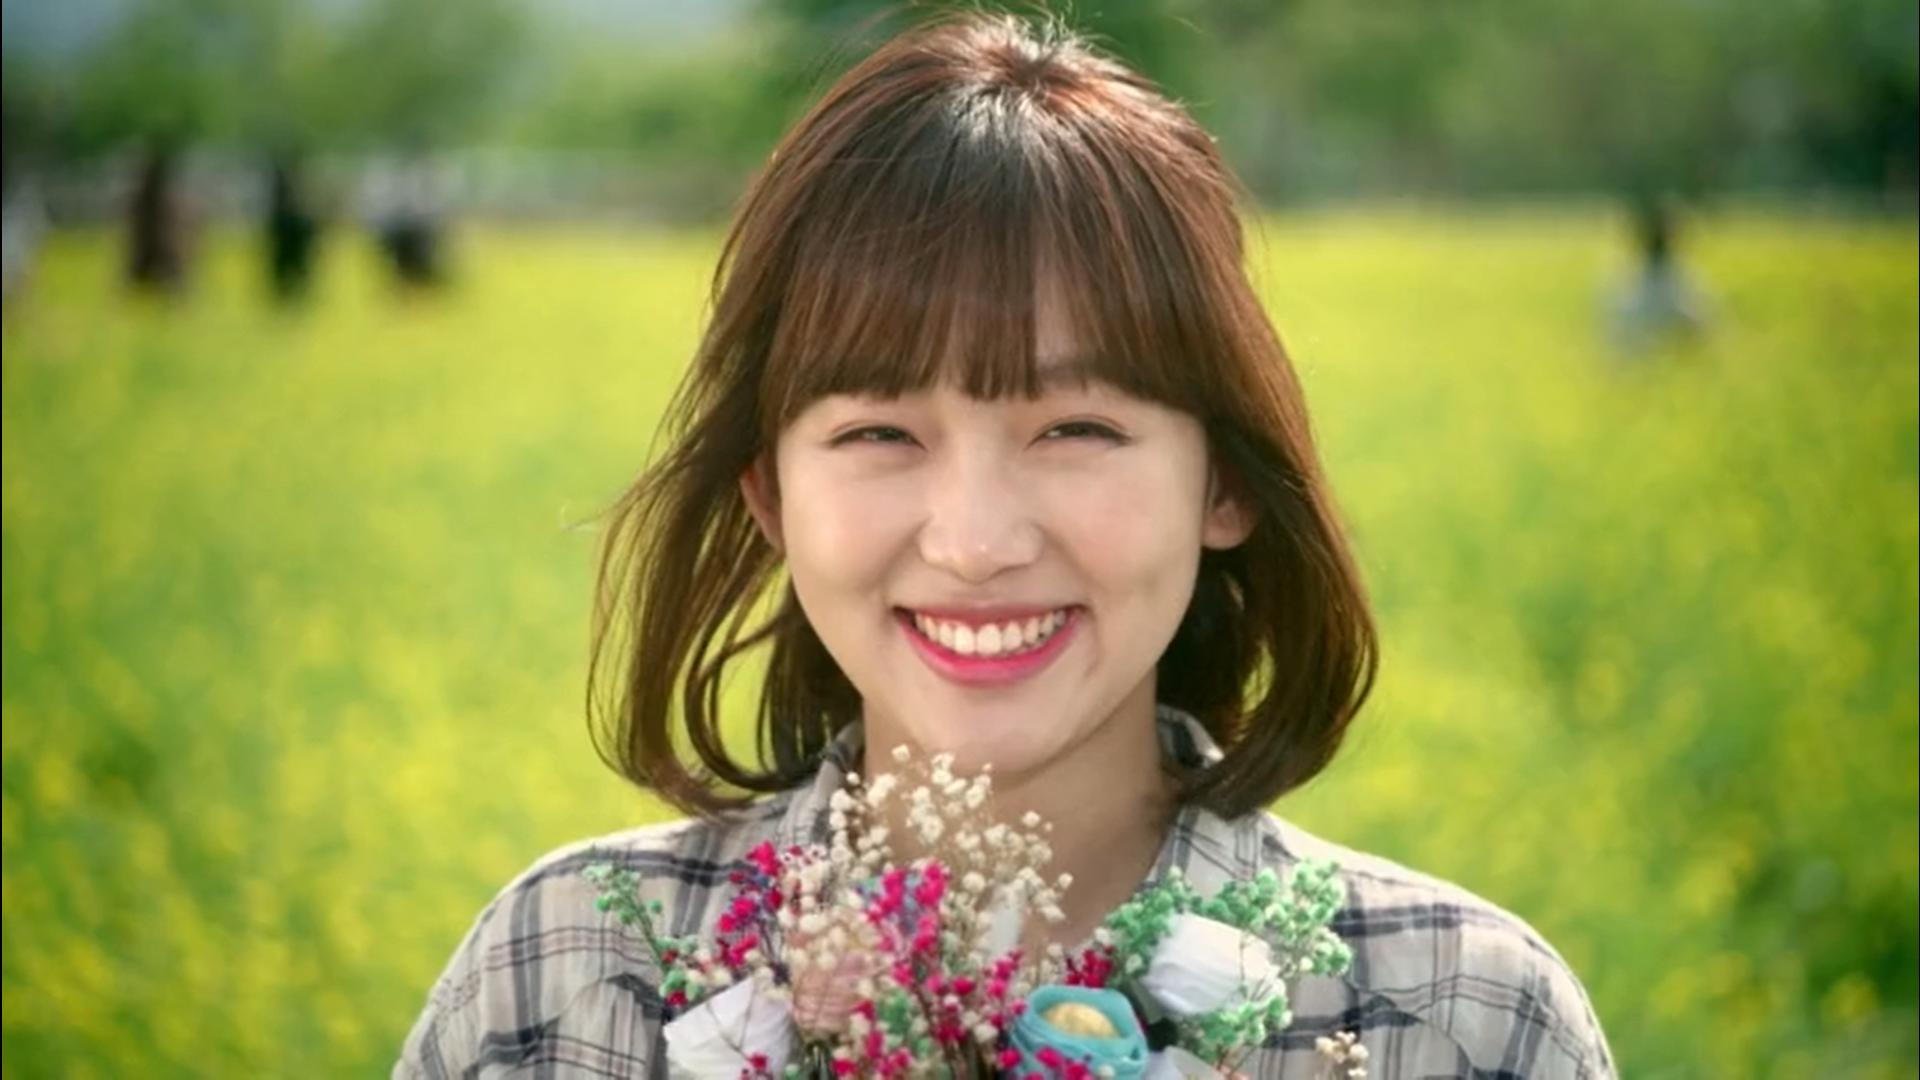 Wednesday 3:30 PM Seon Eun-woo with flowers